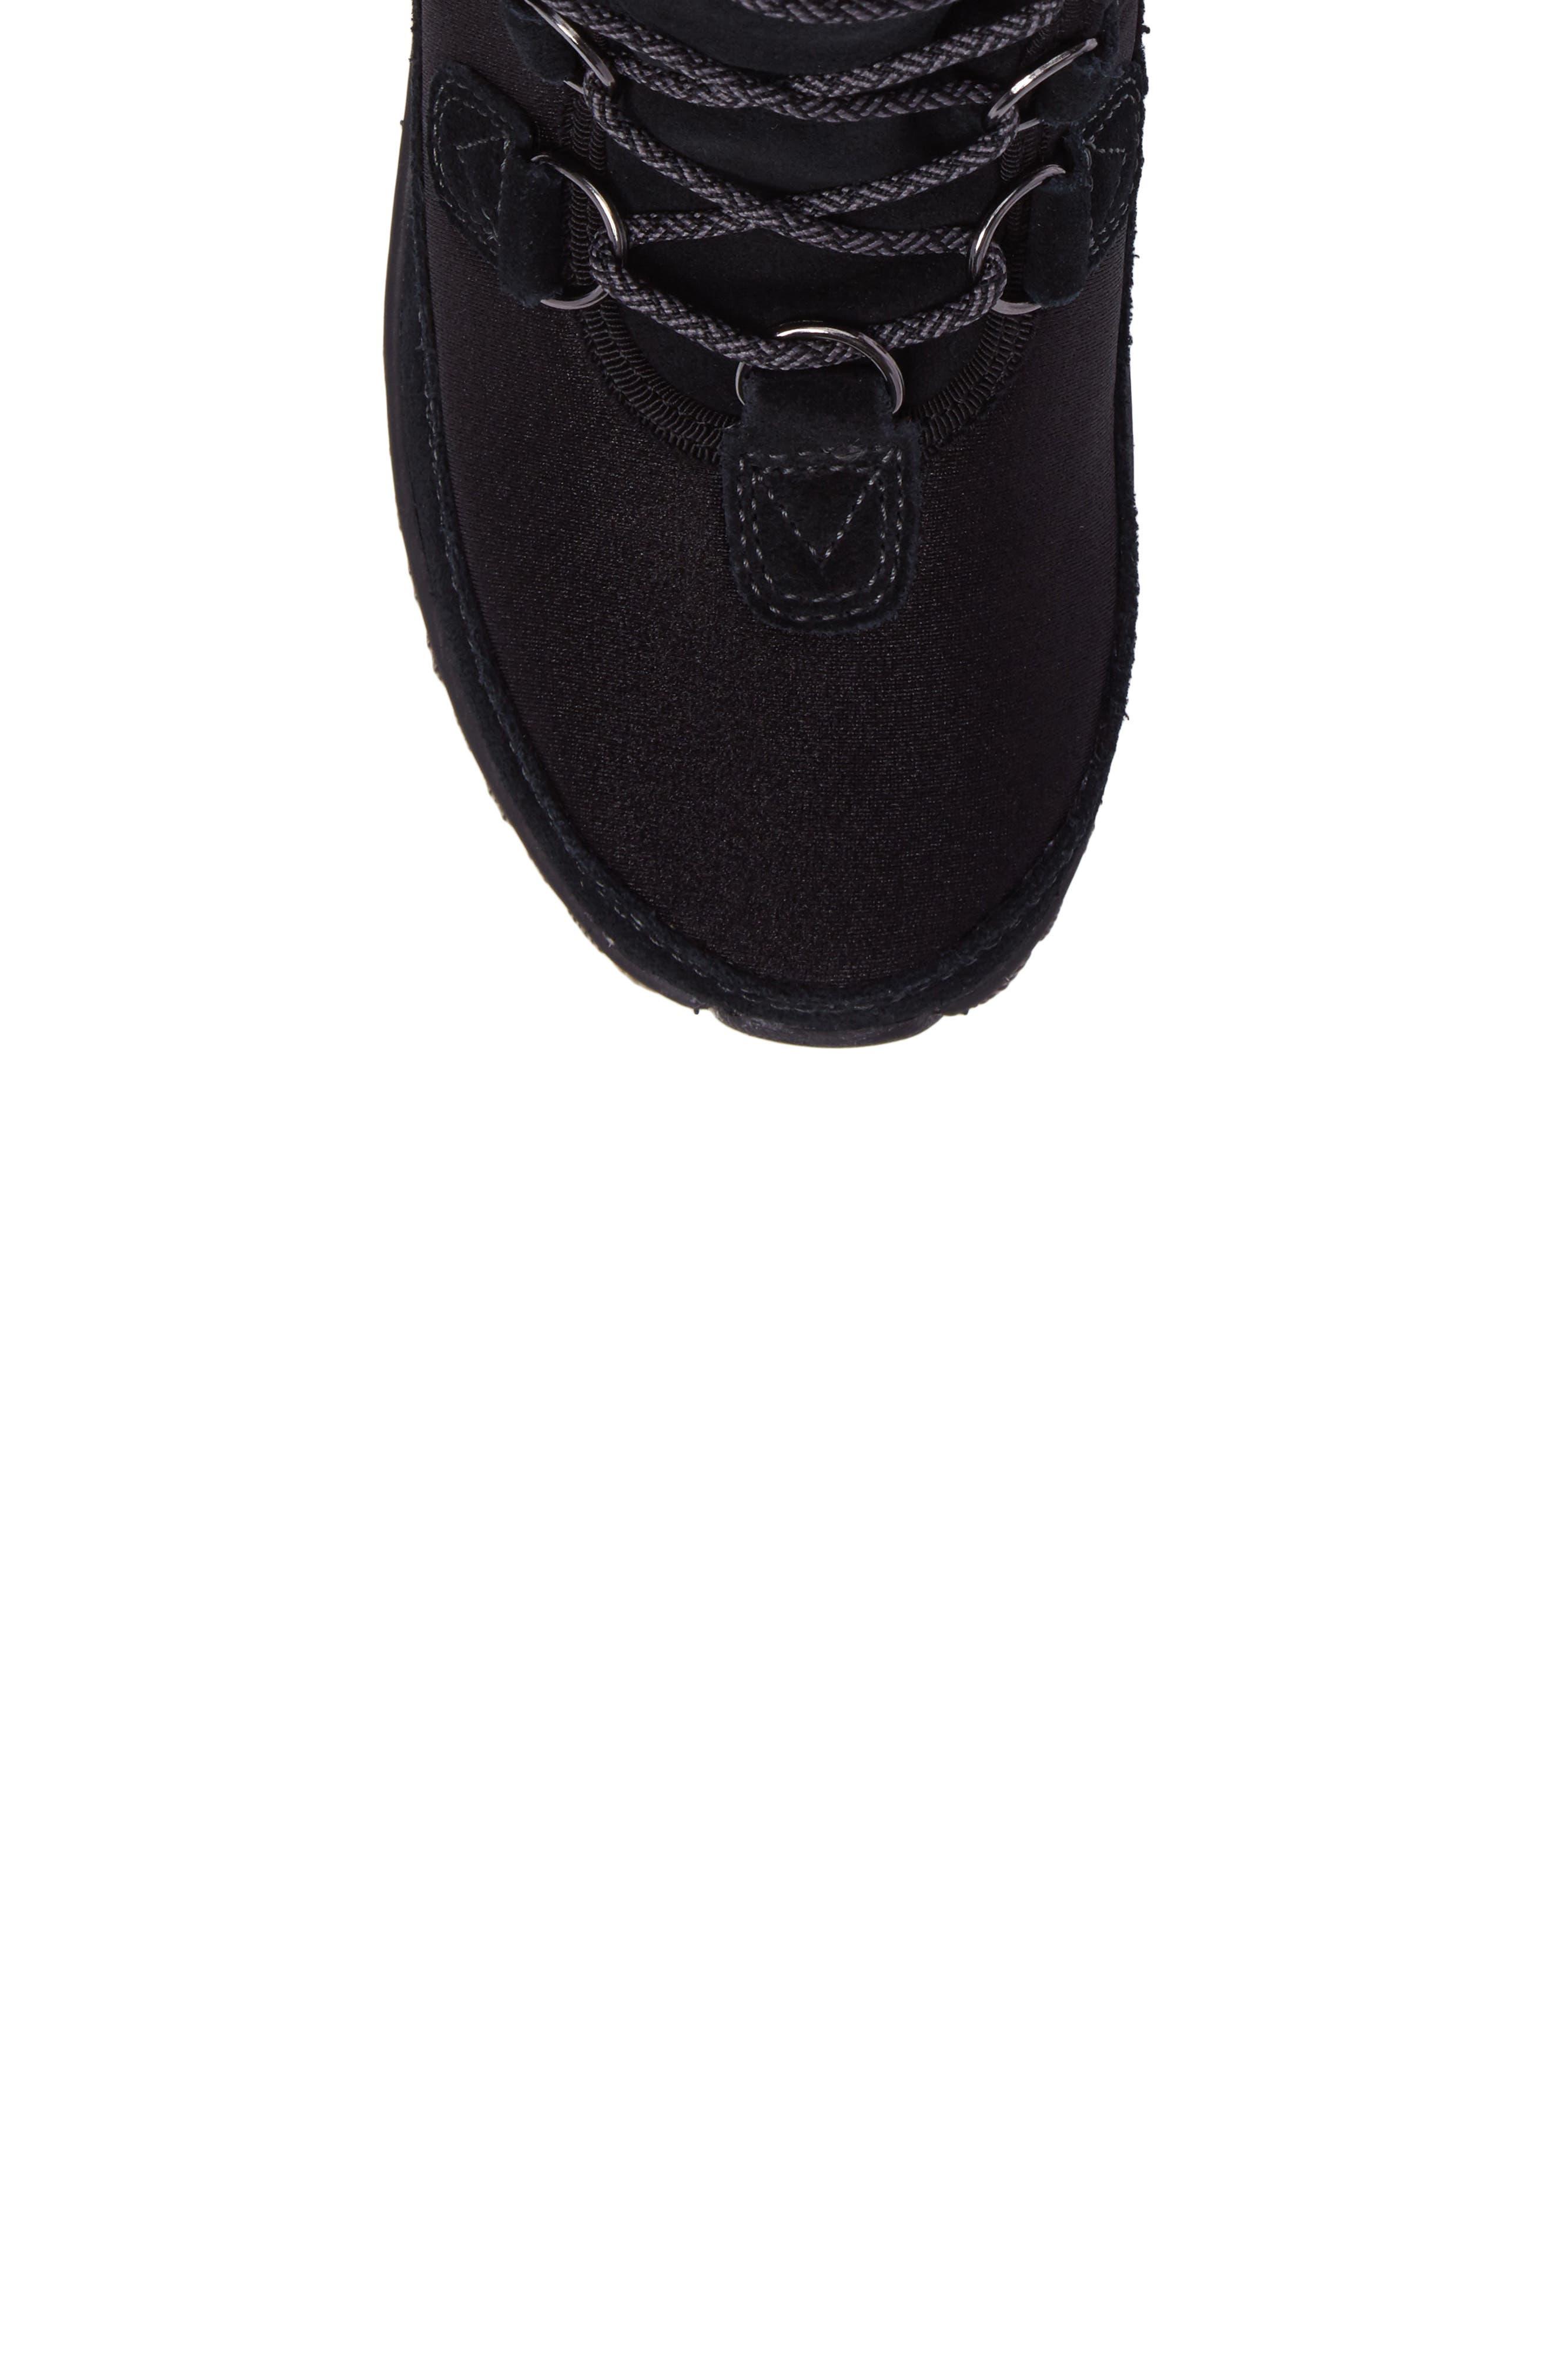 Berries Water Resistant Boot,                             Alternate thumbnail 5, color,                             Blackberry Suede